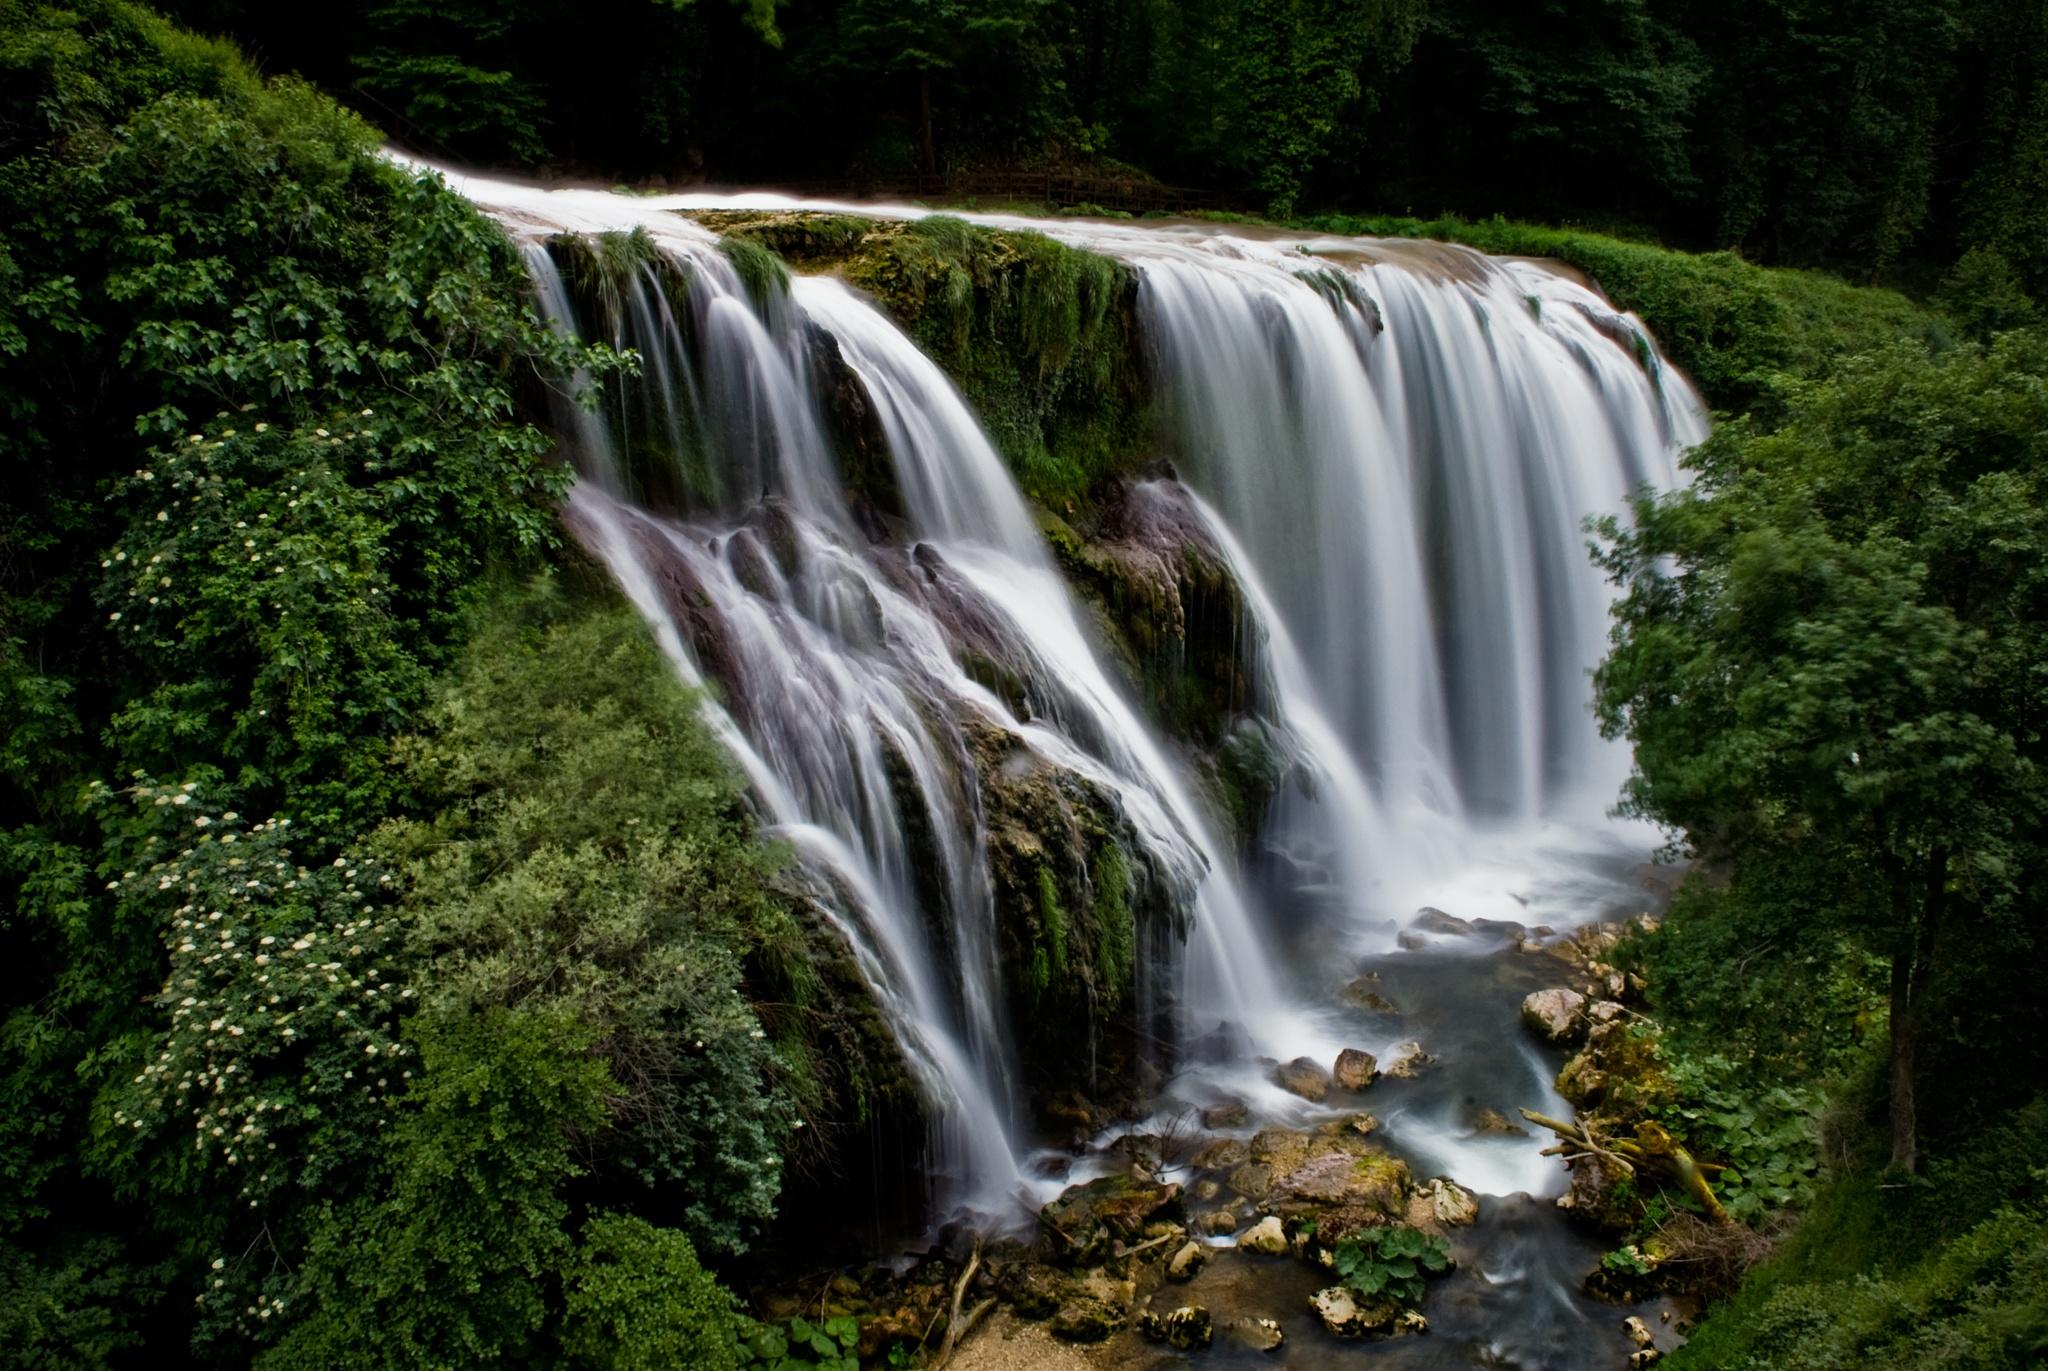 Marmore Falls - Umbria, Italy by Eric Kazmirek